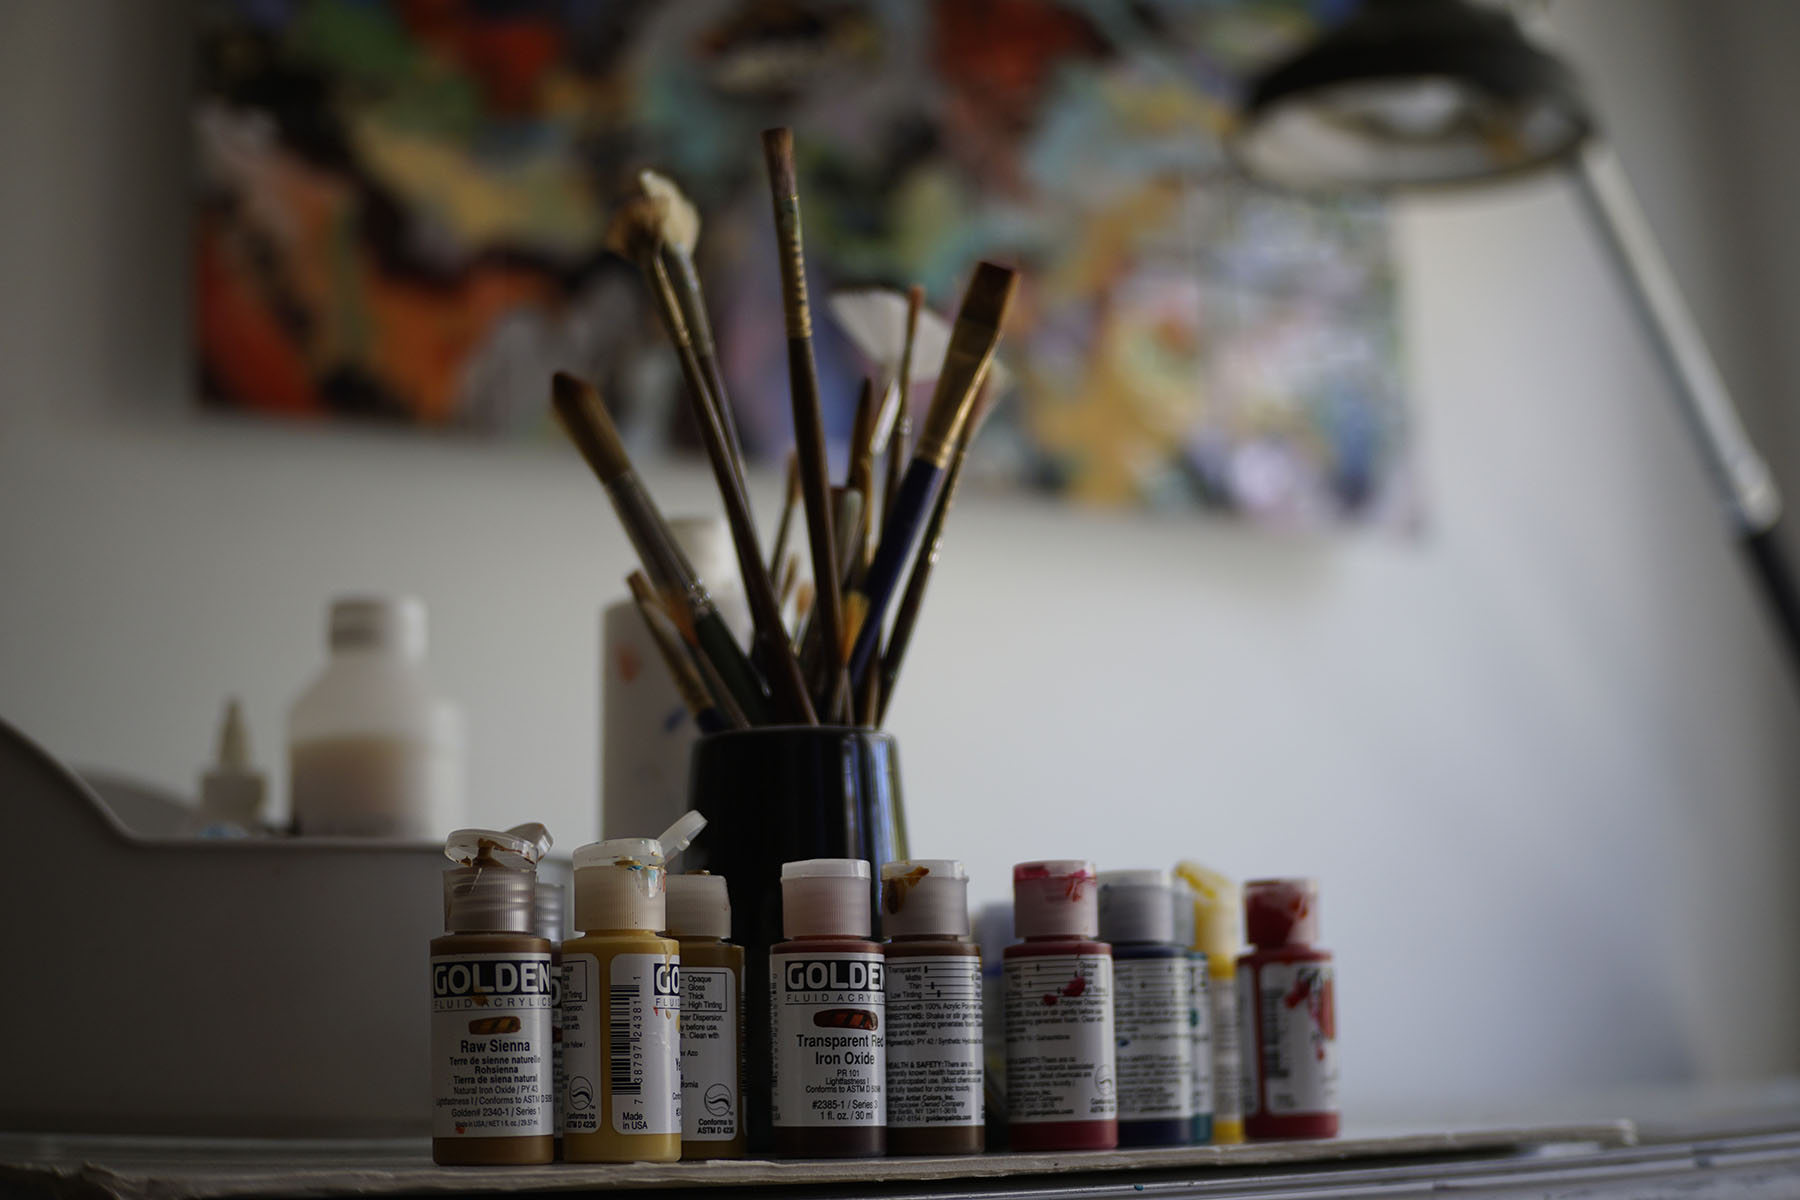 artist truong buu giam desk brushes